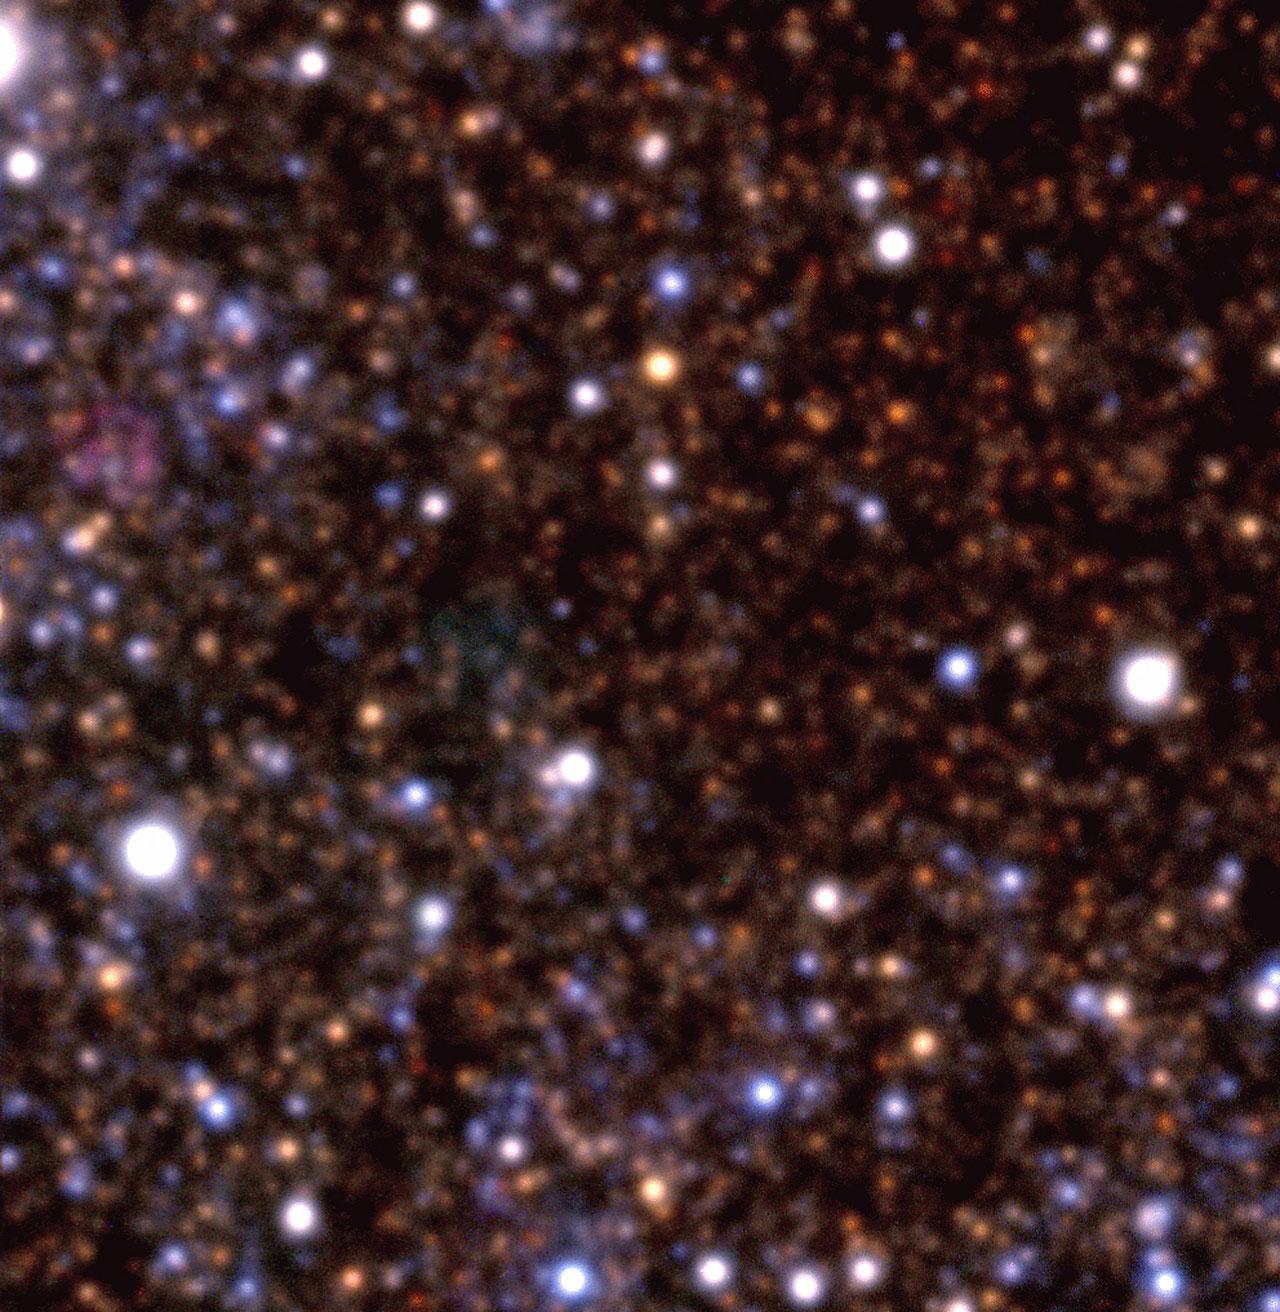 Field in Dwarf Galaxy NGC 6822